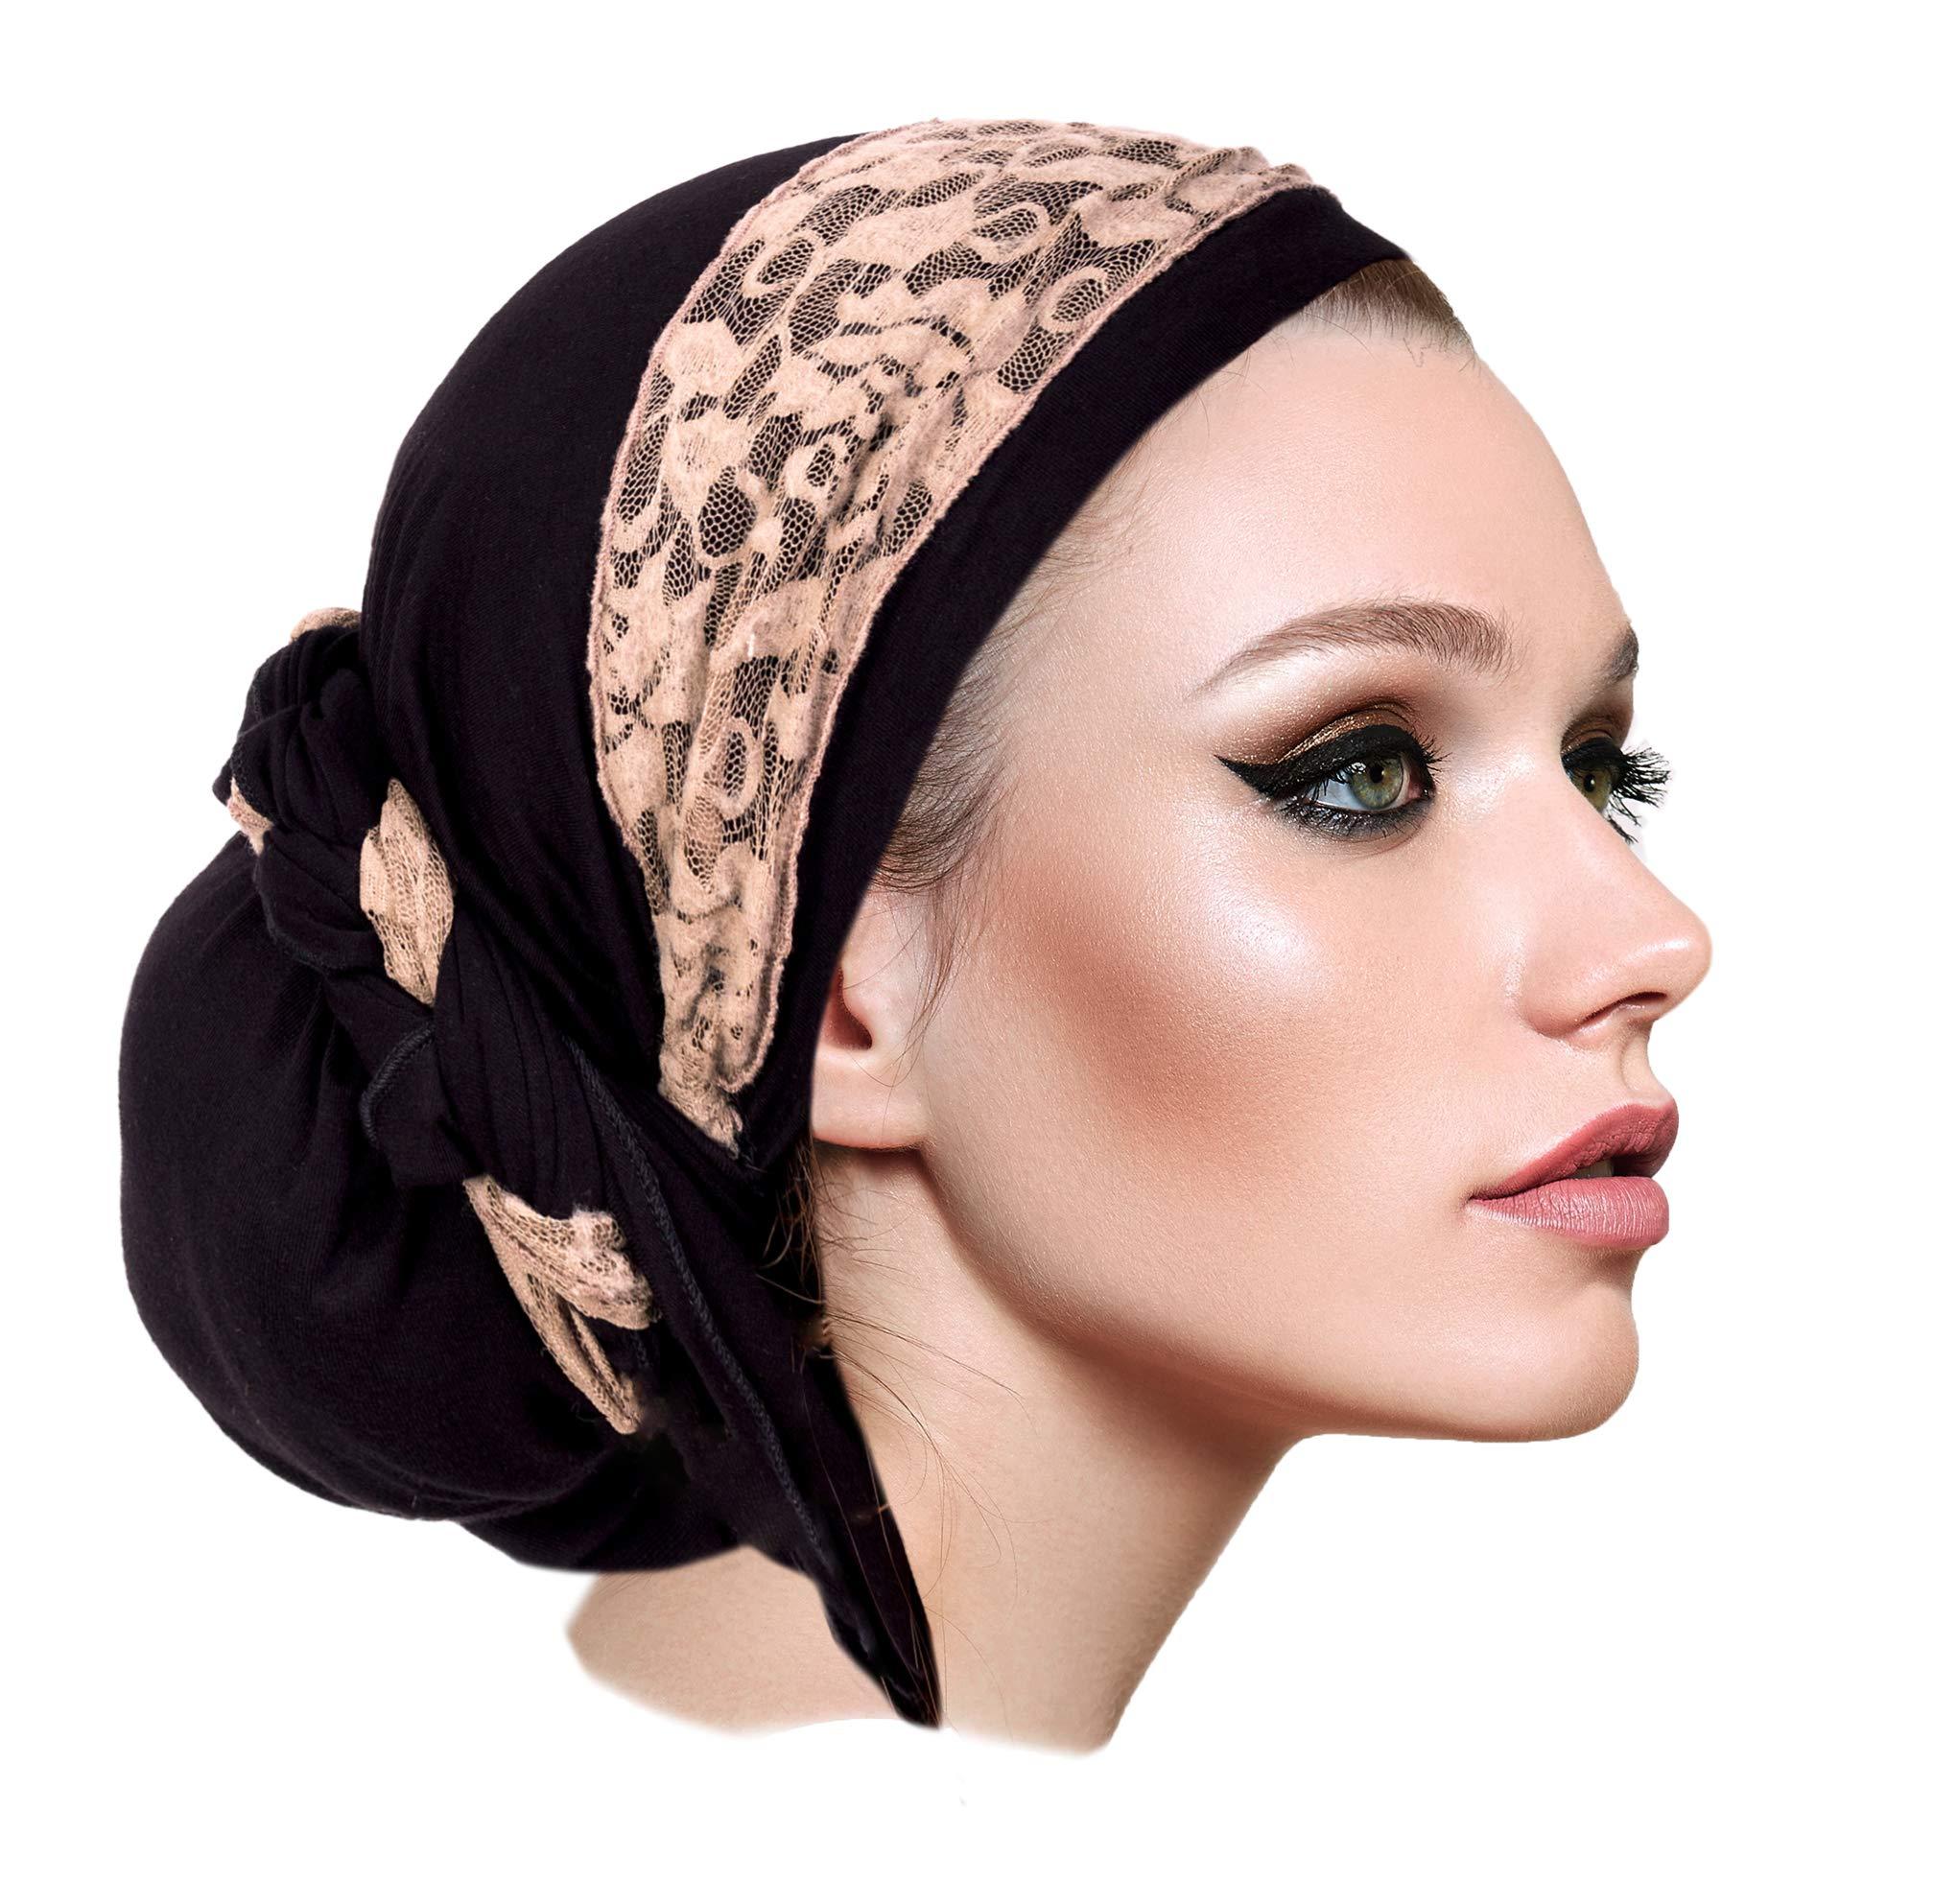 ShariRose Boho Chic Long Black Headscarf Tichel Headwear for Women with Vintage Cream lace wrap! Handmade 076 by ShariRose